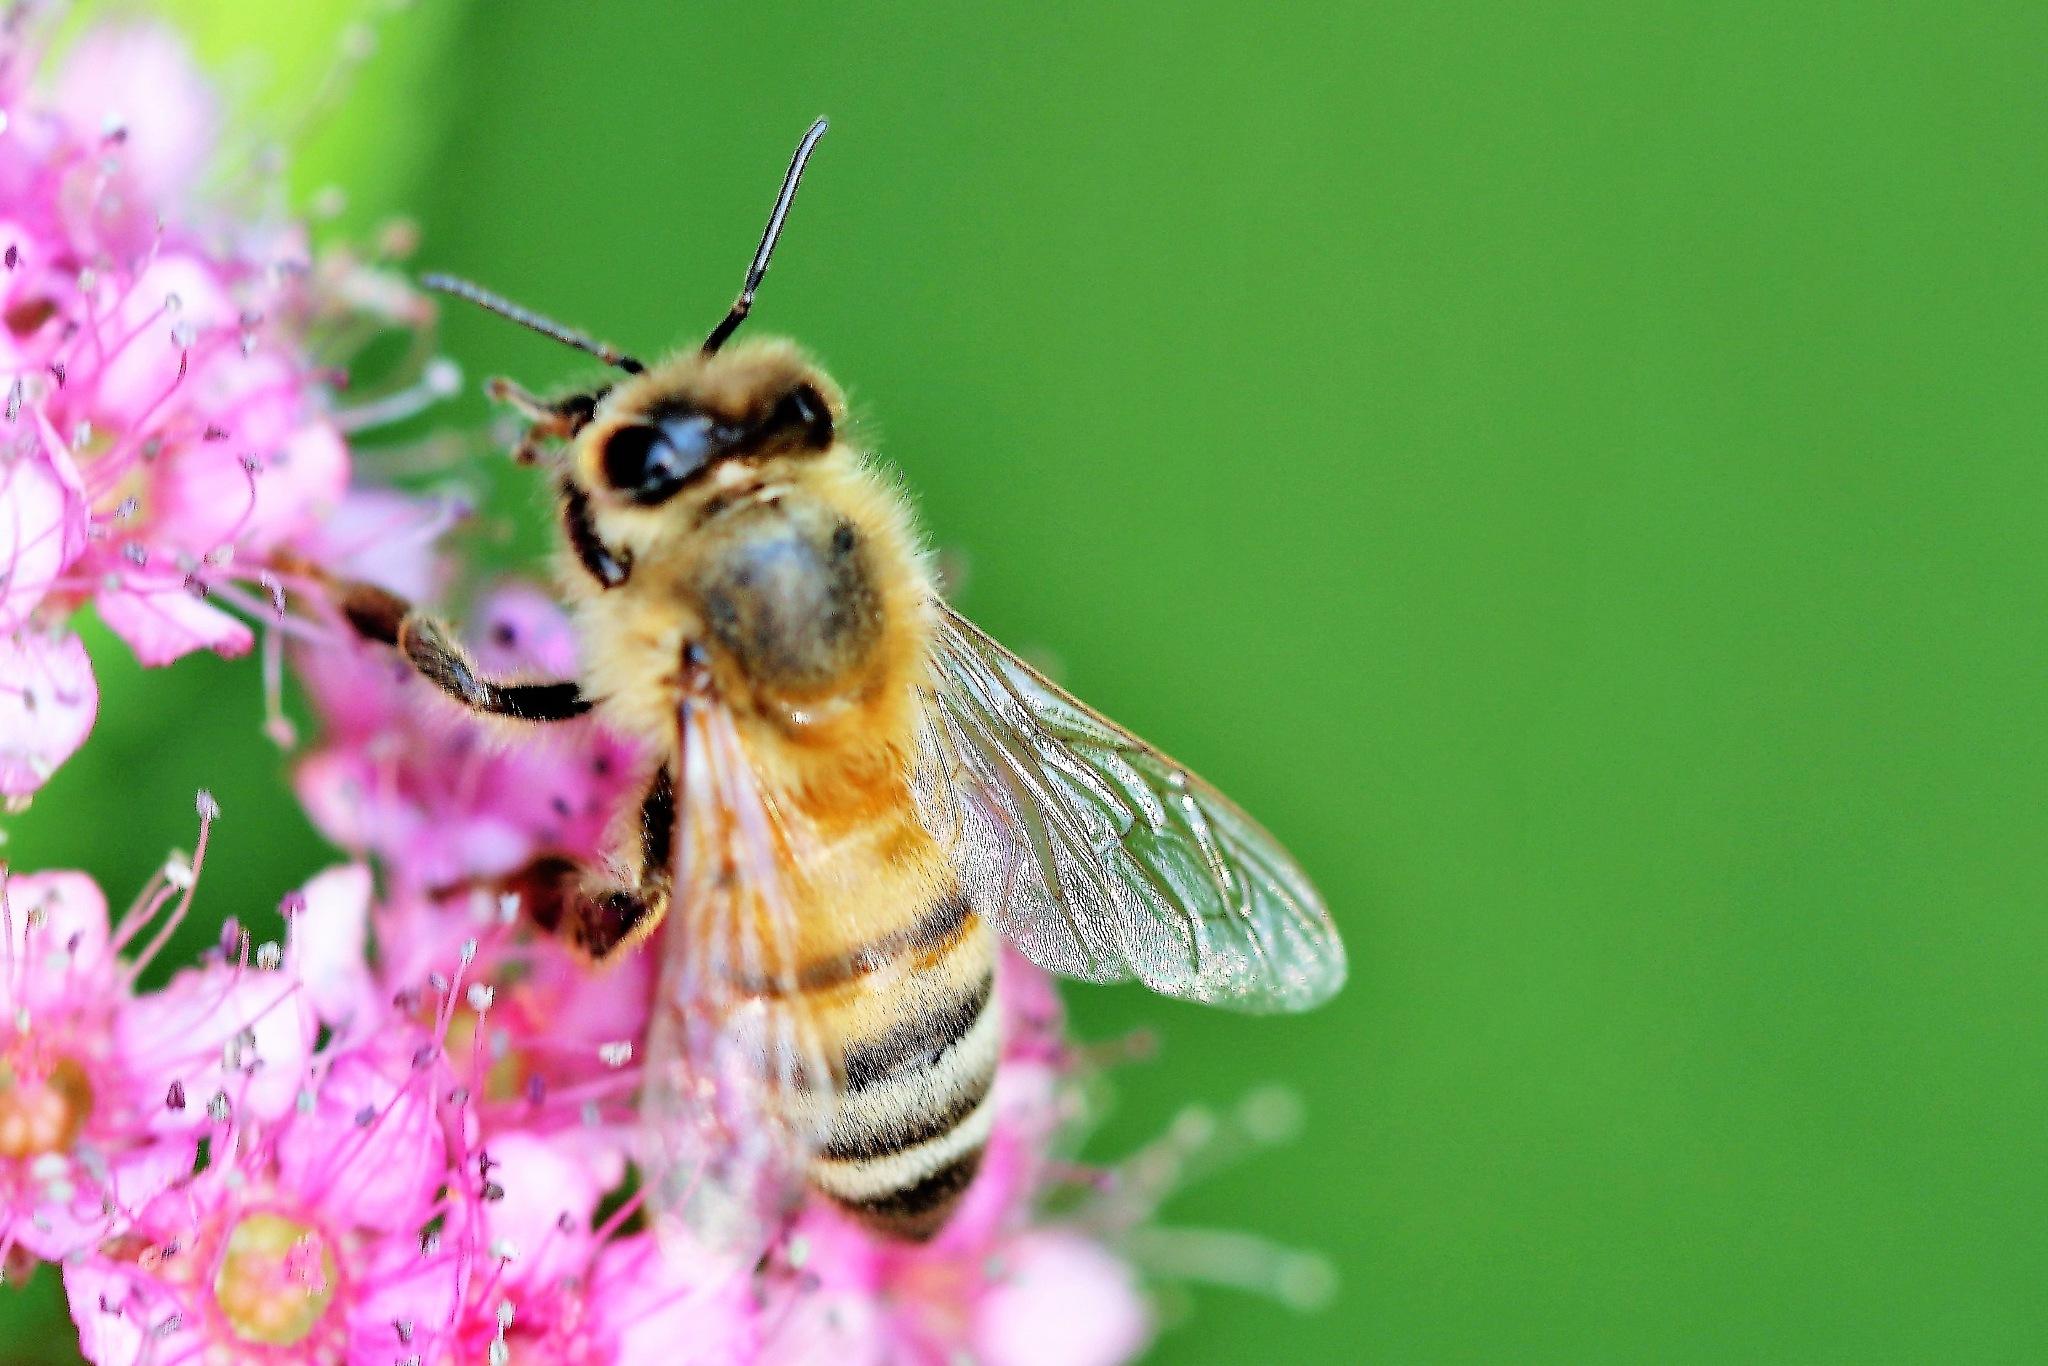 Big Bee by timothyduffus